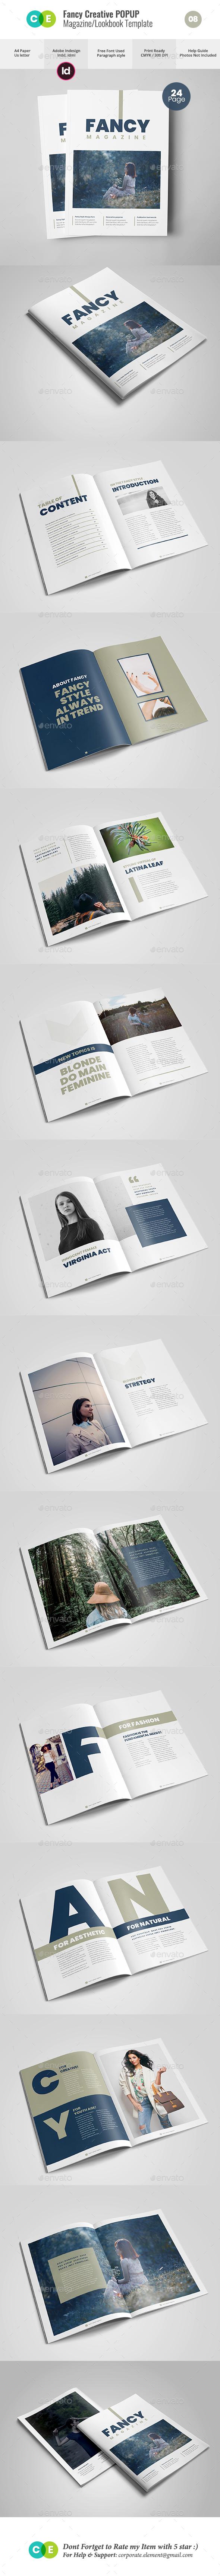 FANCY Fashion Minimal Magazine / Lookbook V08 - Magazines Print Templates